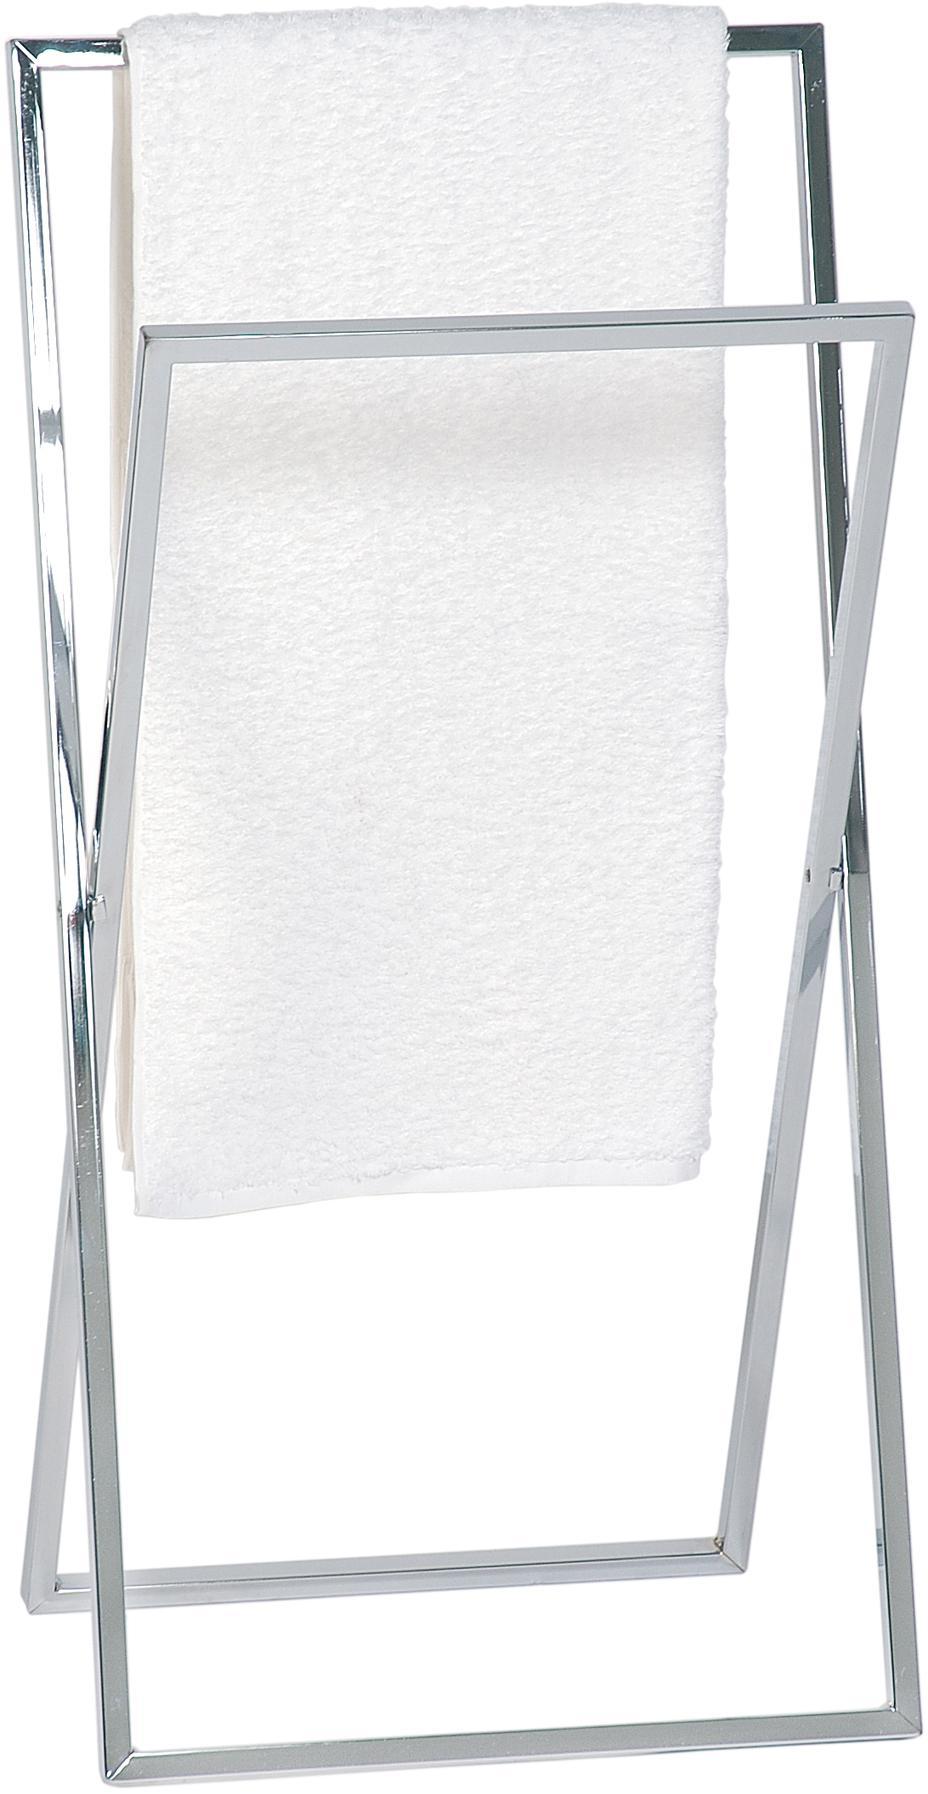 Portasciugamani Brentford, Metallo, Metallo, Larg. 45 x Alt. 89 cm